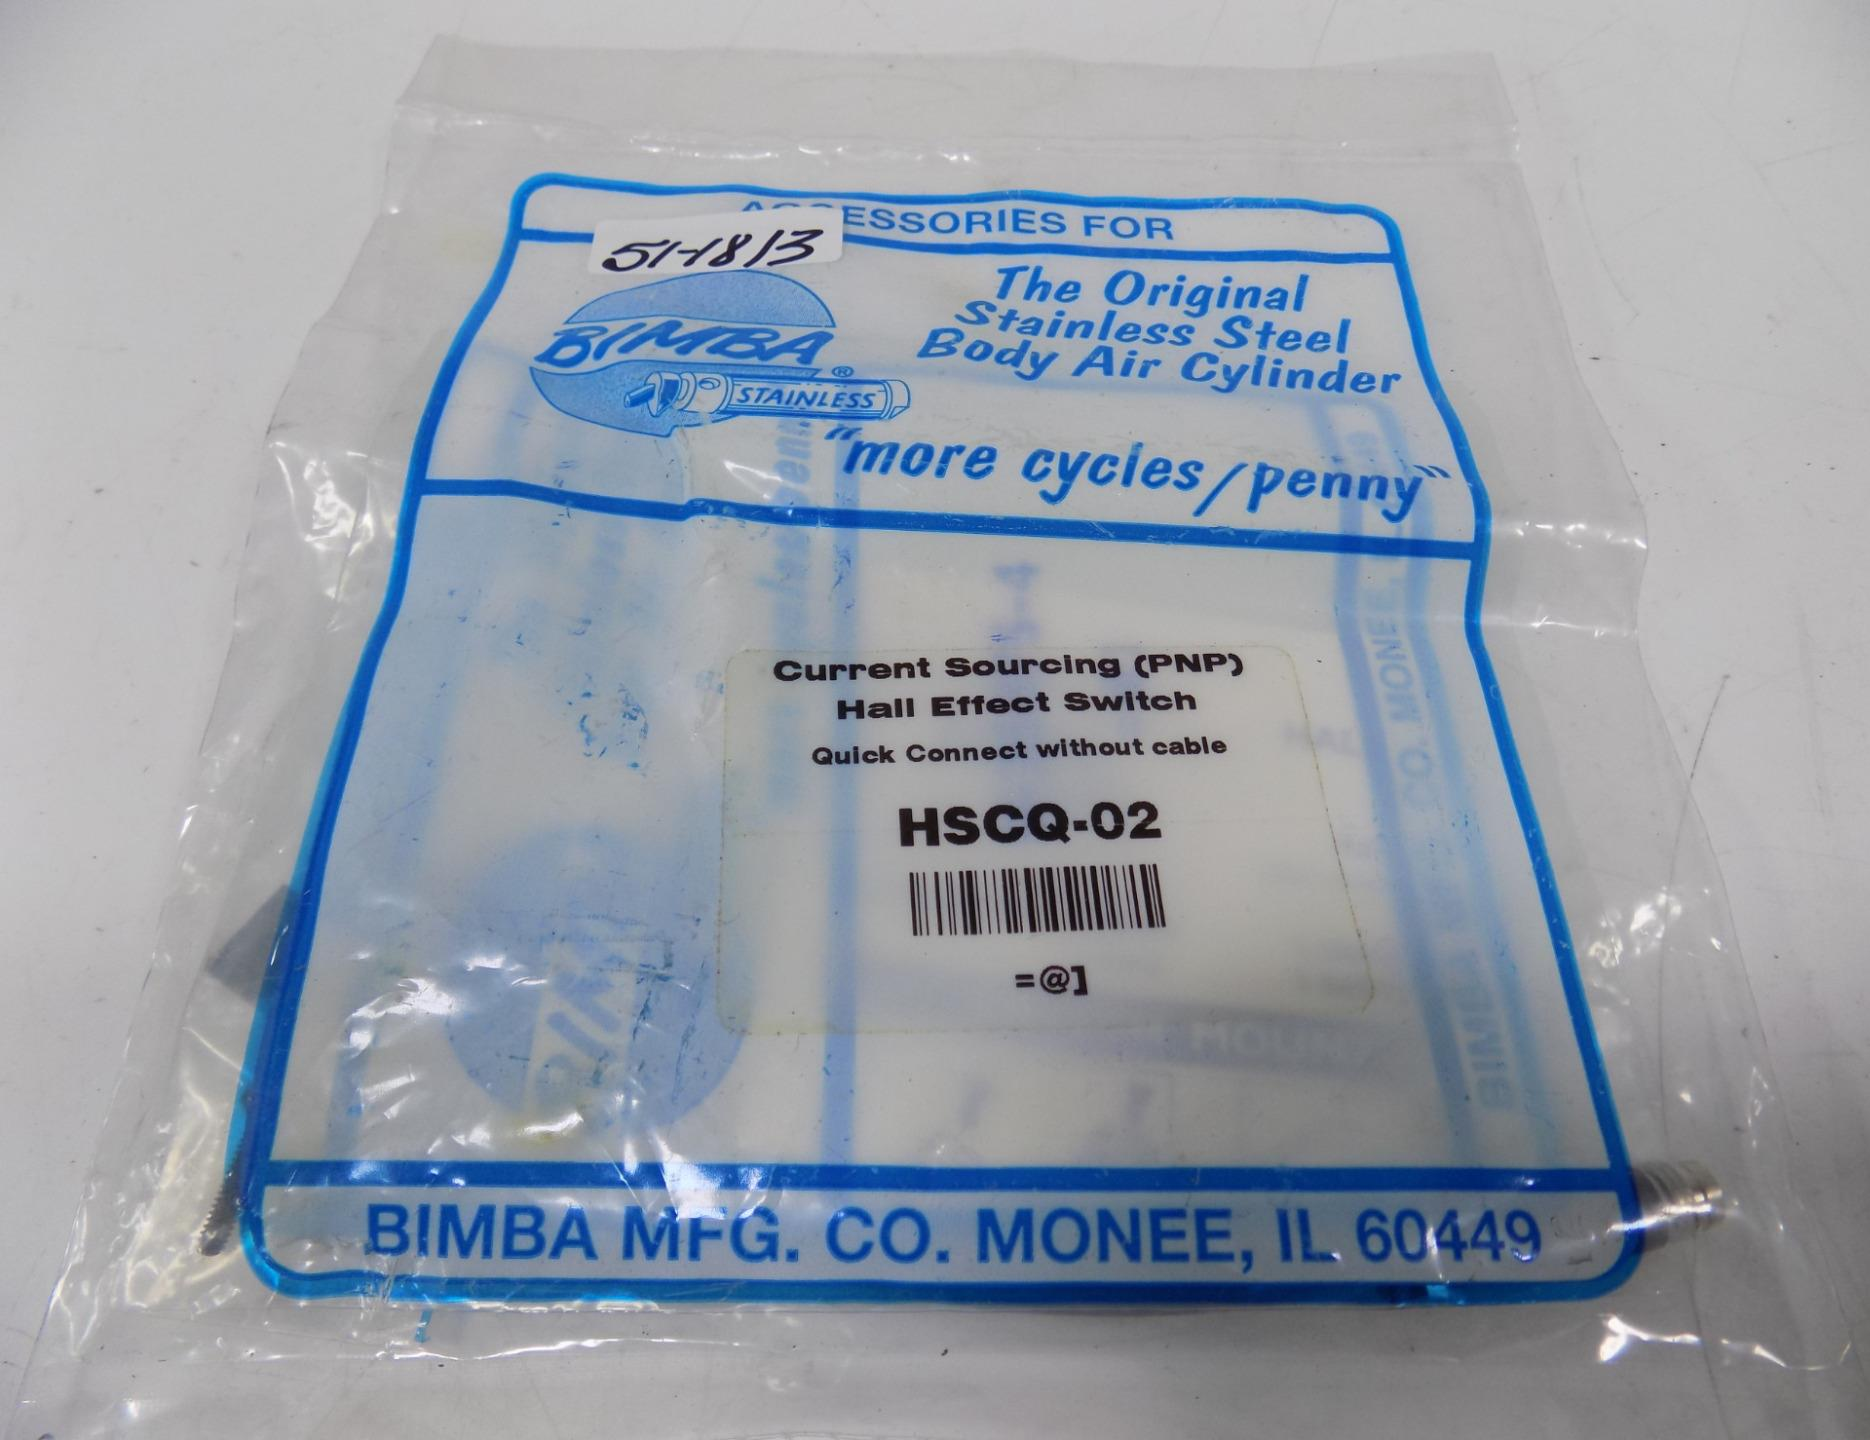 Bimba Hall Effect Switch Switchjpg Nib Ebay 1870x1440